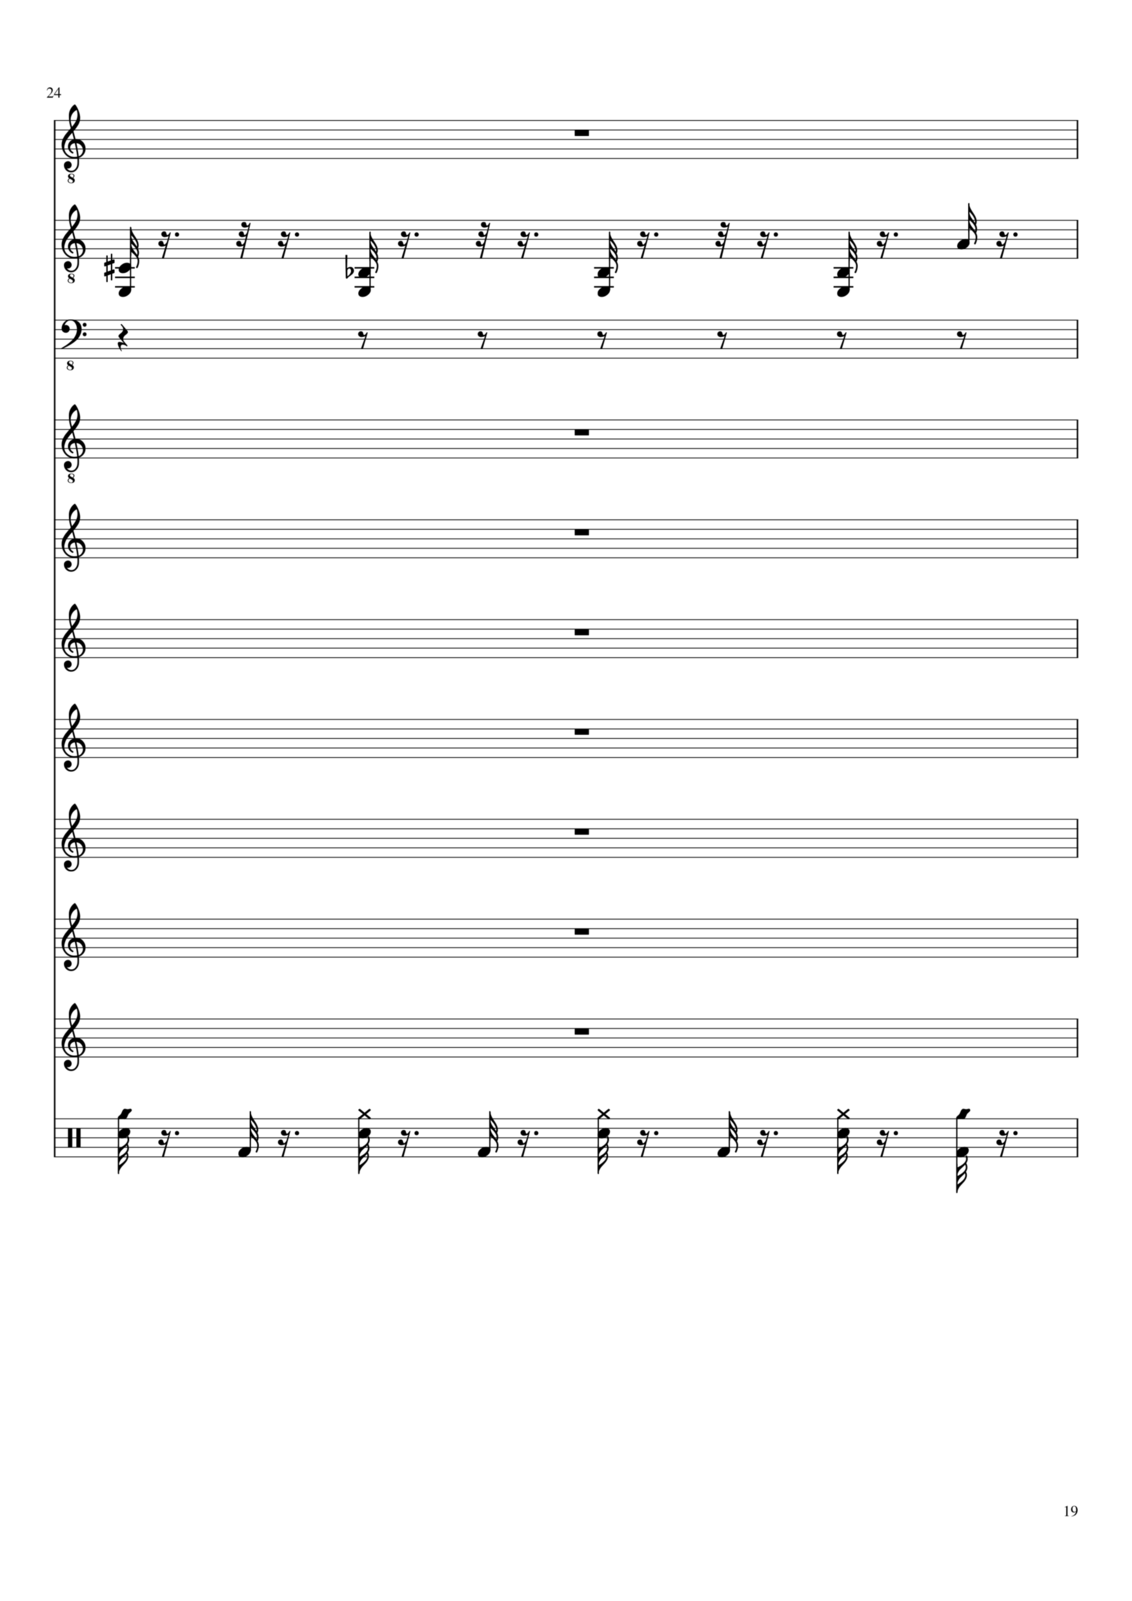 Belyiy sokol slide, Image 19